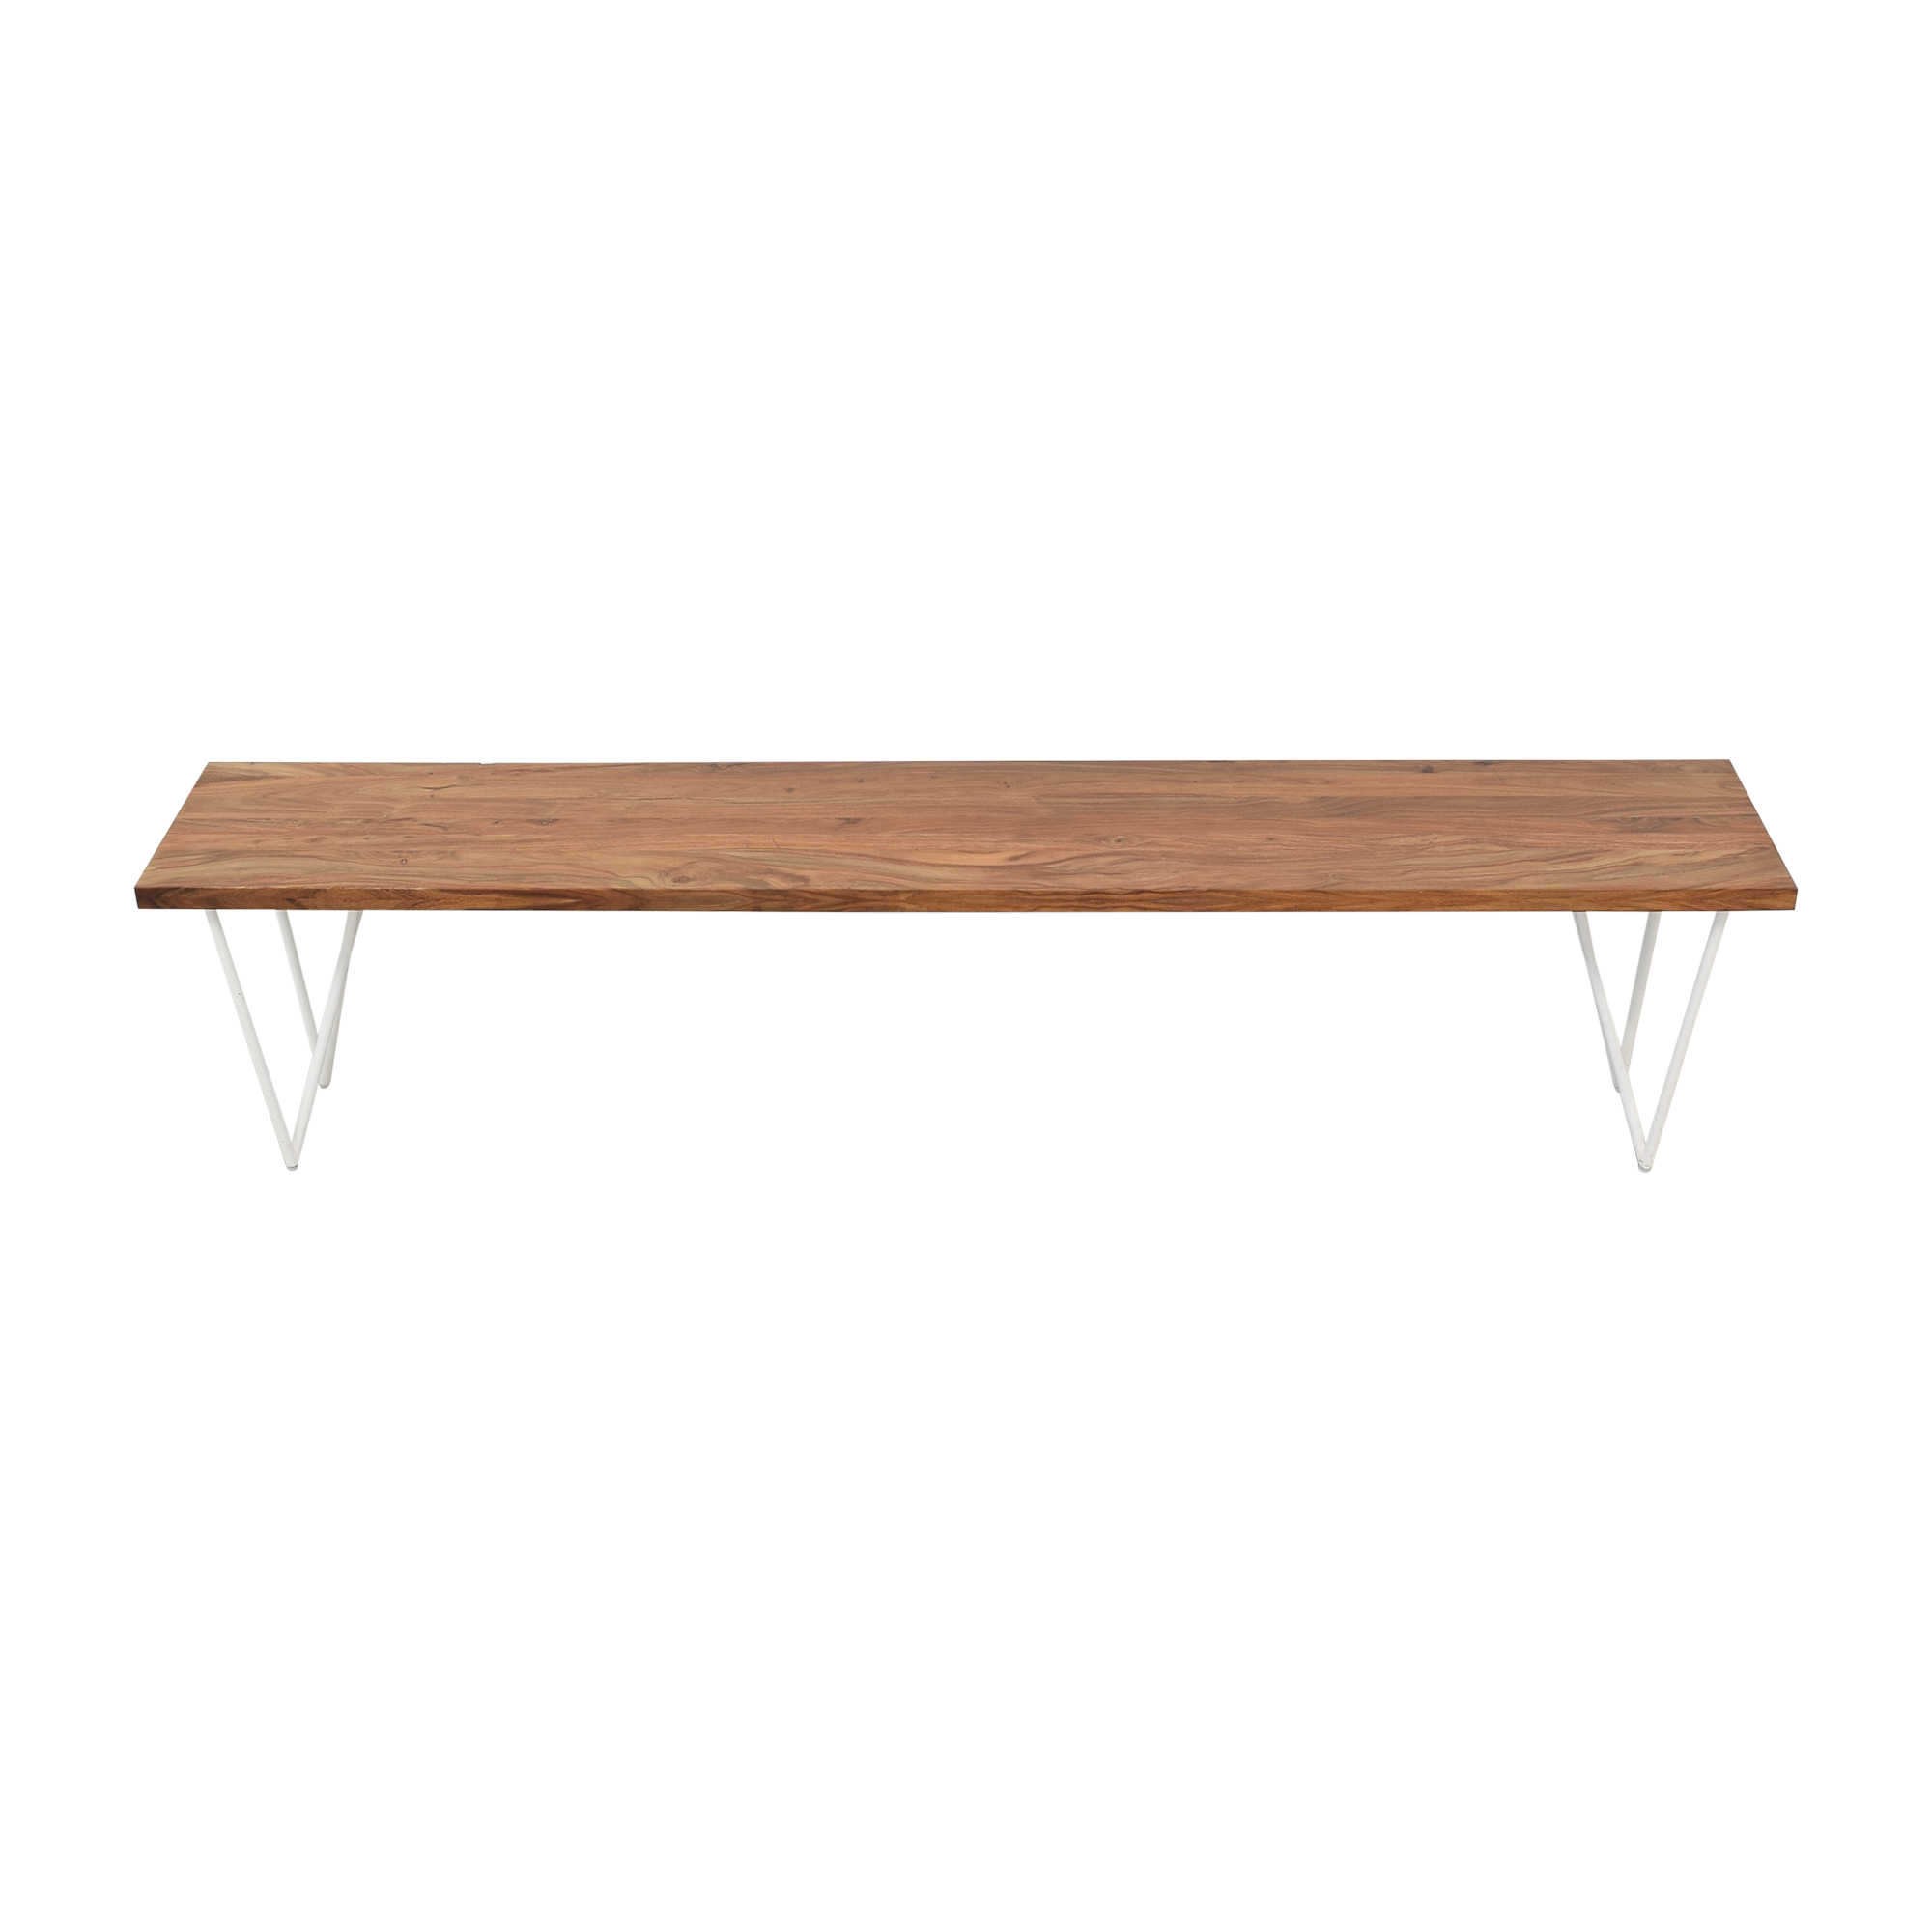 CB2 CB2 Wood Bench pa